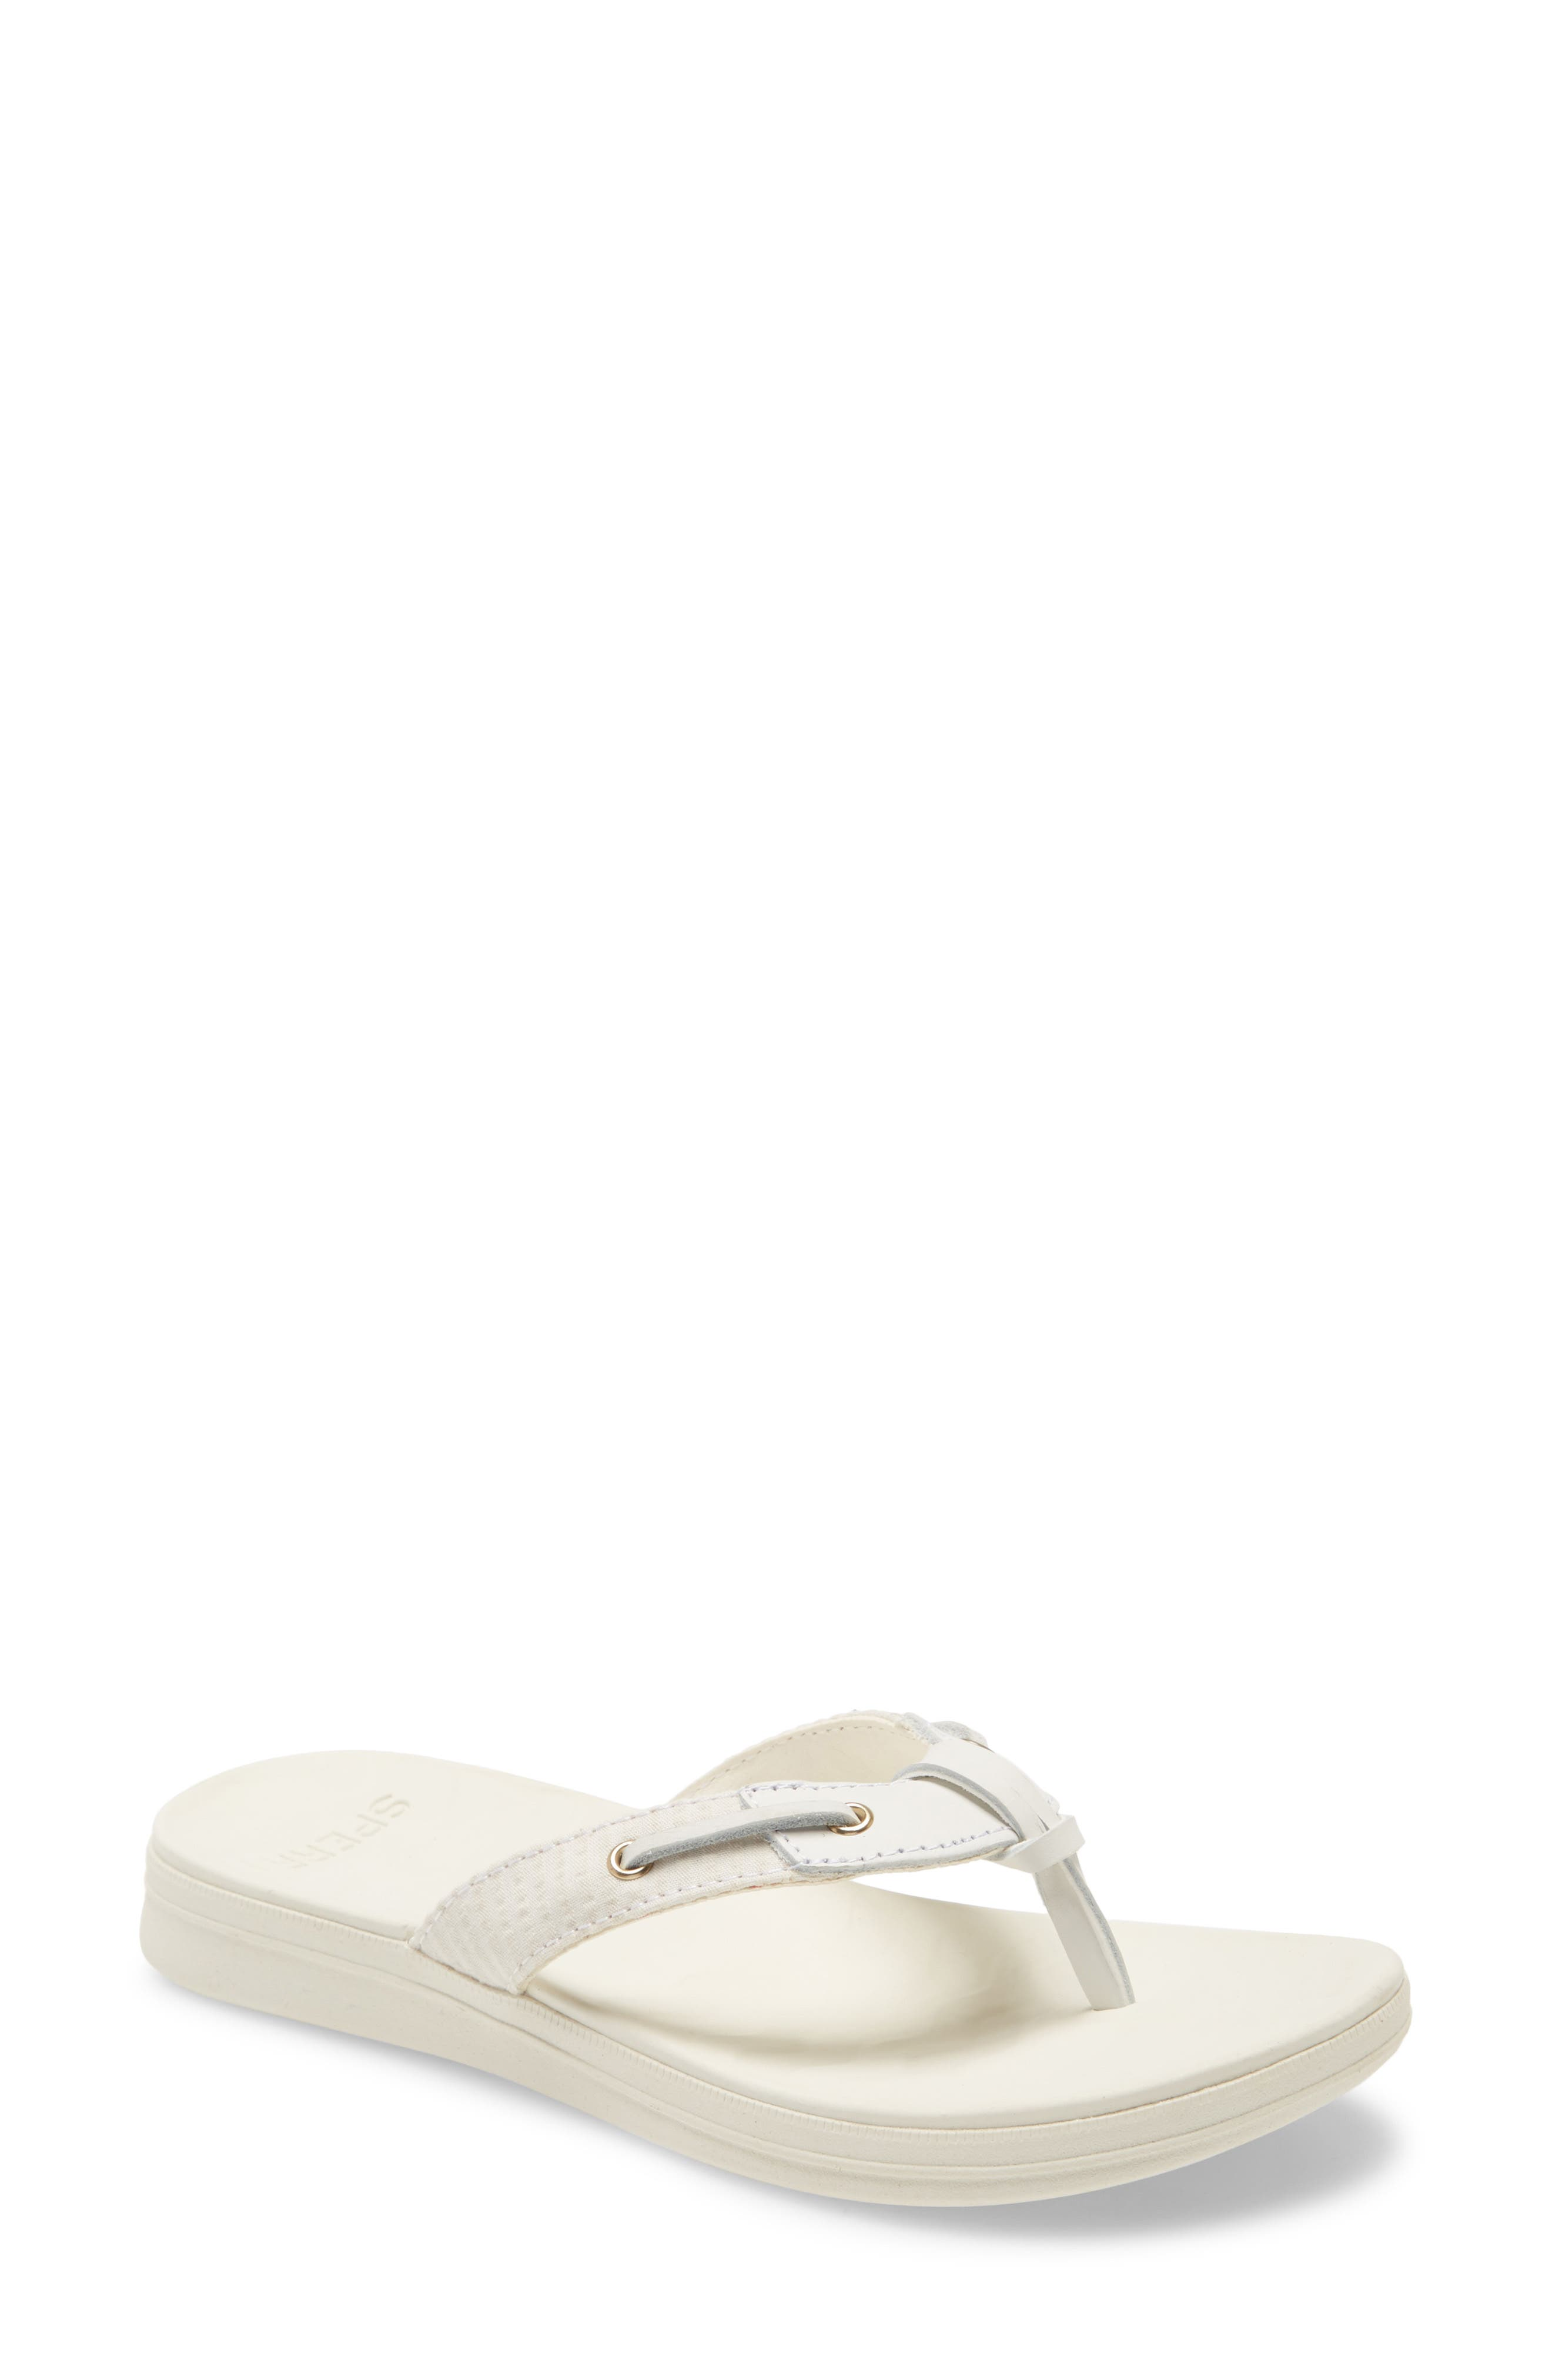 Sperry | Adriatic Flip Flop Sandal